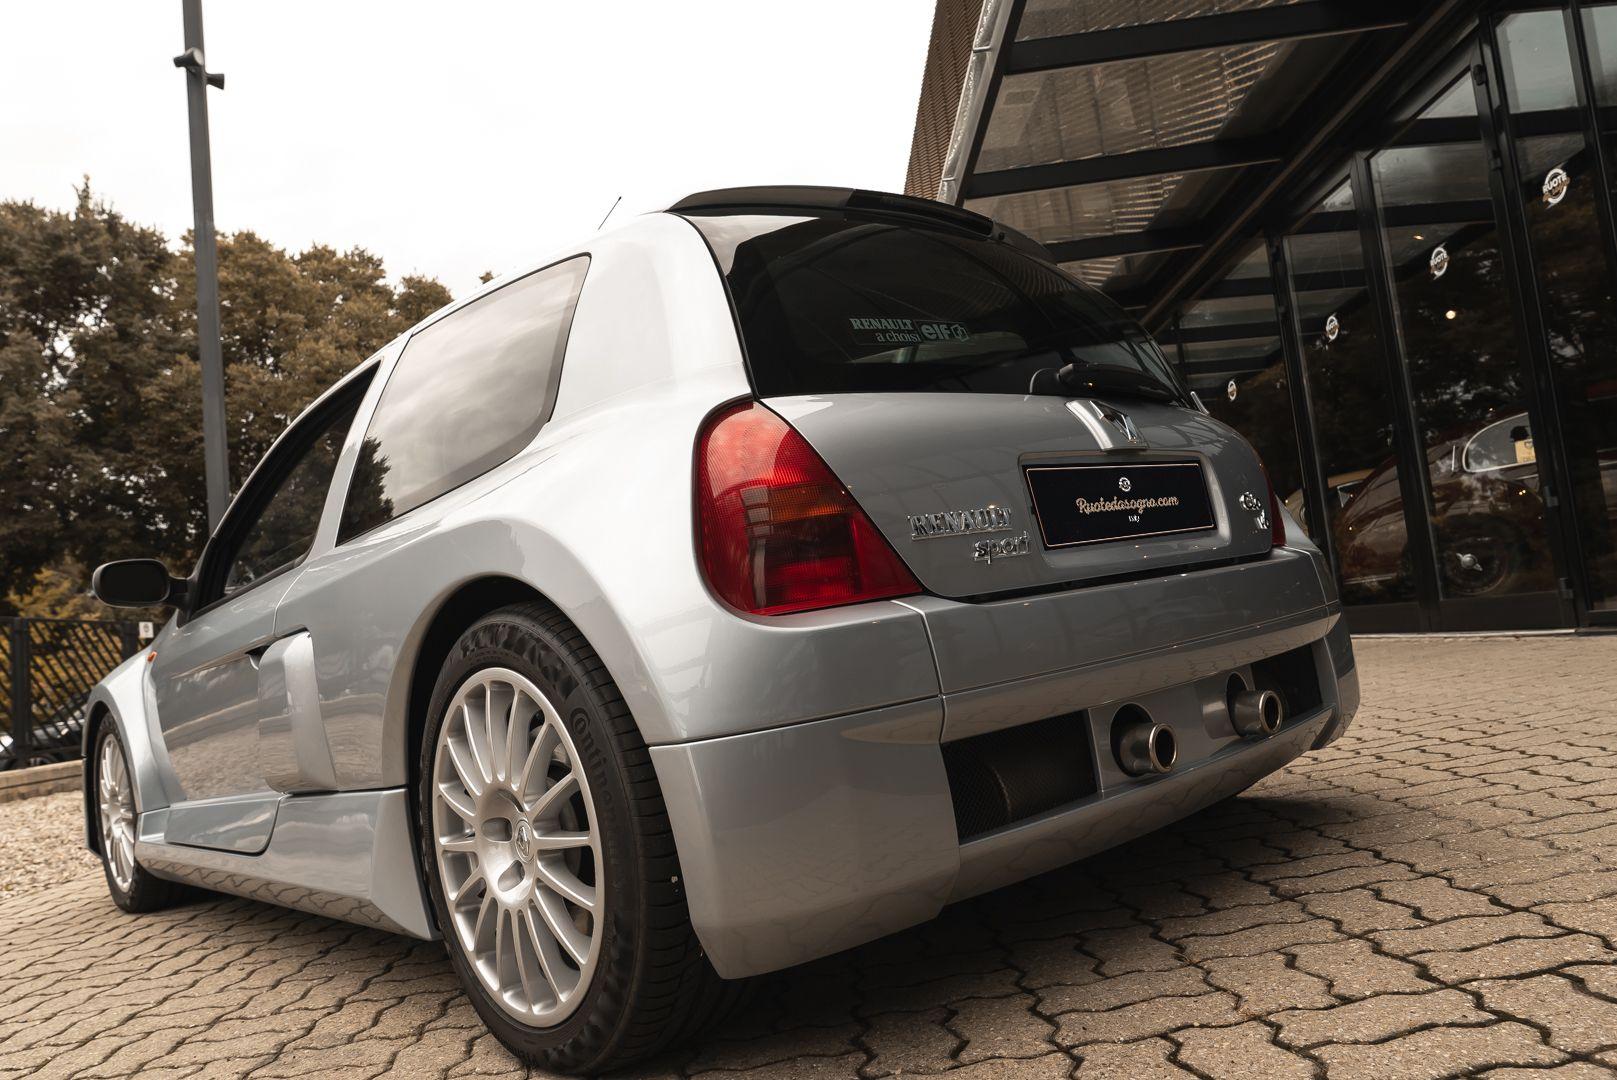 2002 Renault Clio 3.0 V6 Renault Sport Phase1 84926